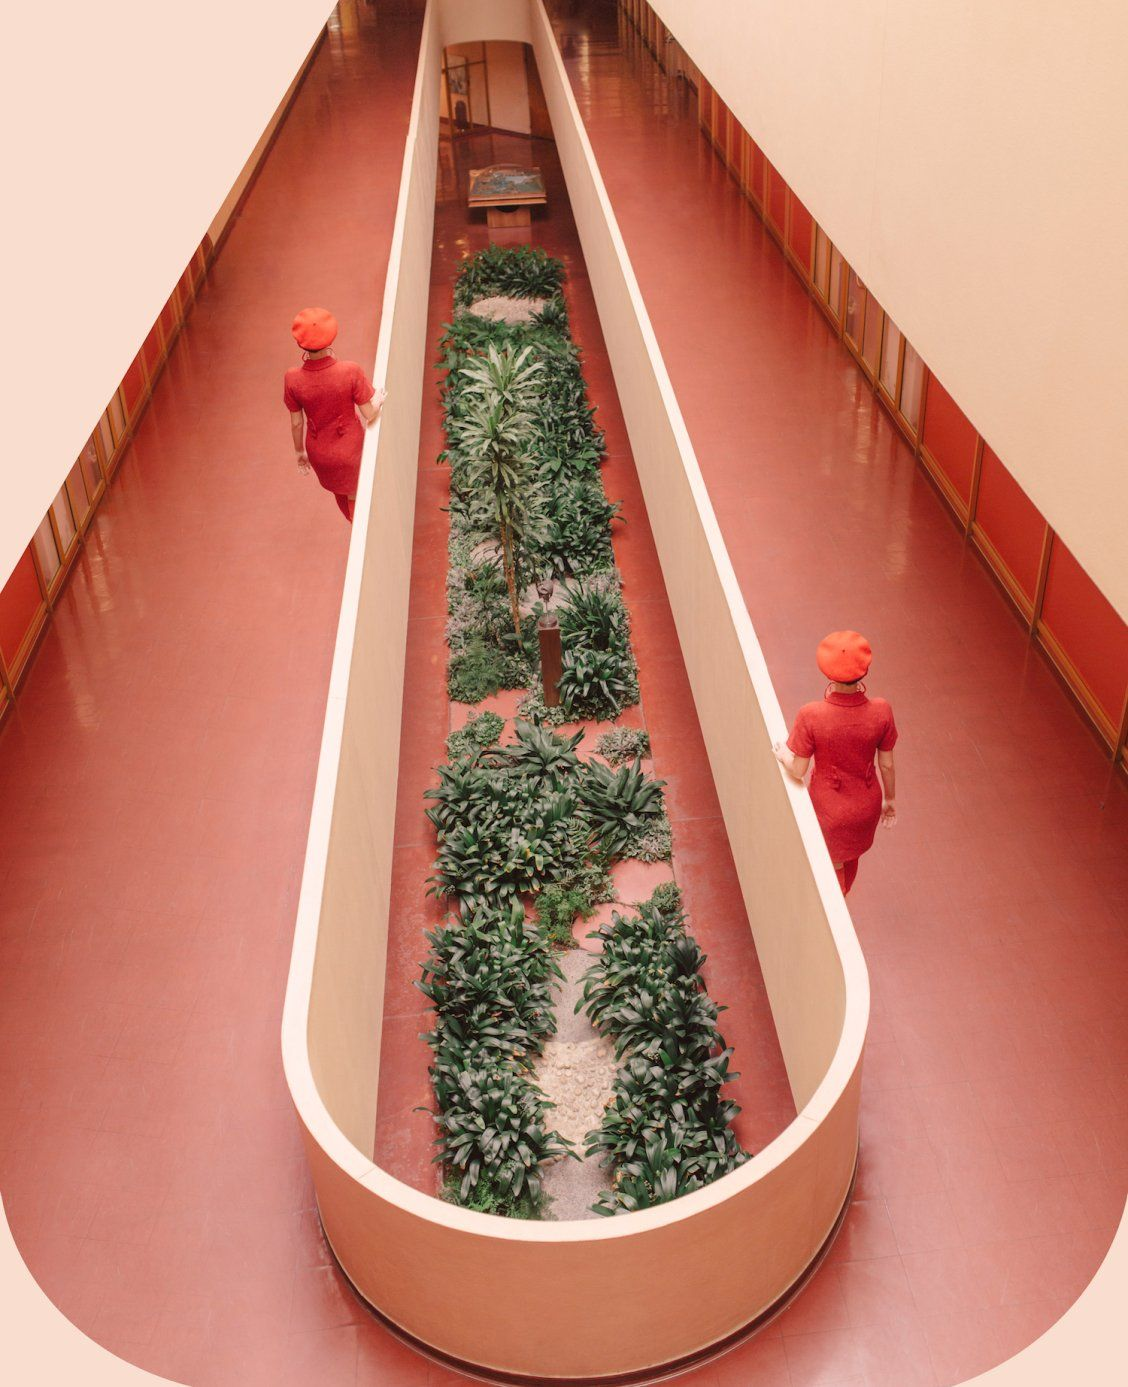 """Curve"" Art by dianevilladsen on Society6 | Society6 thumbnail"